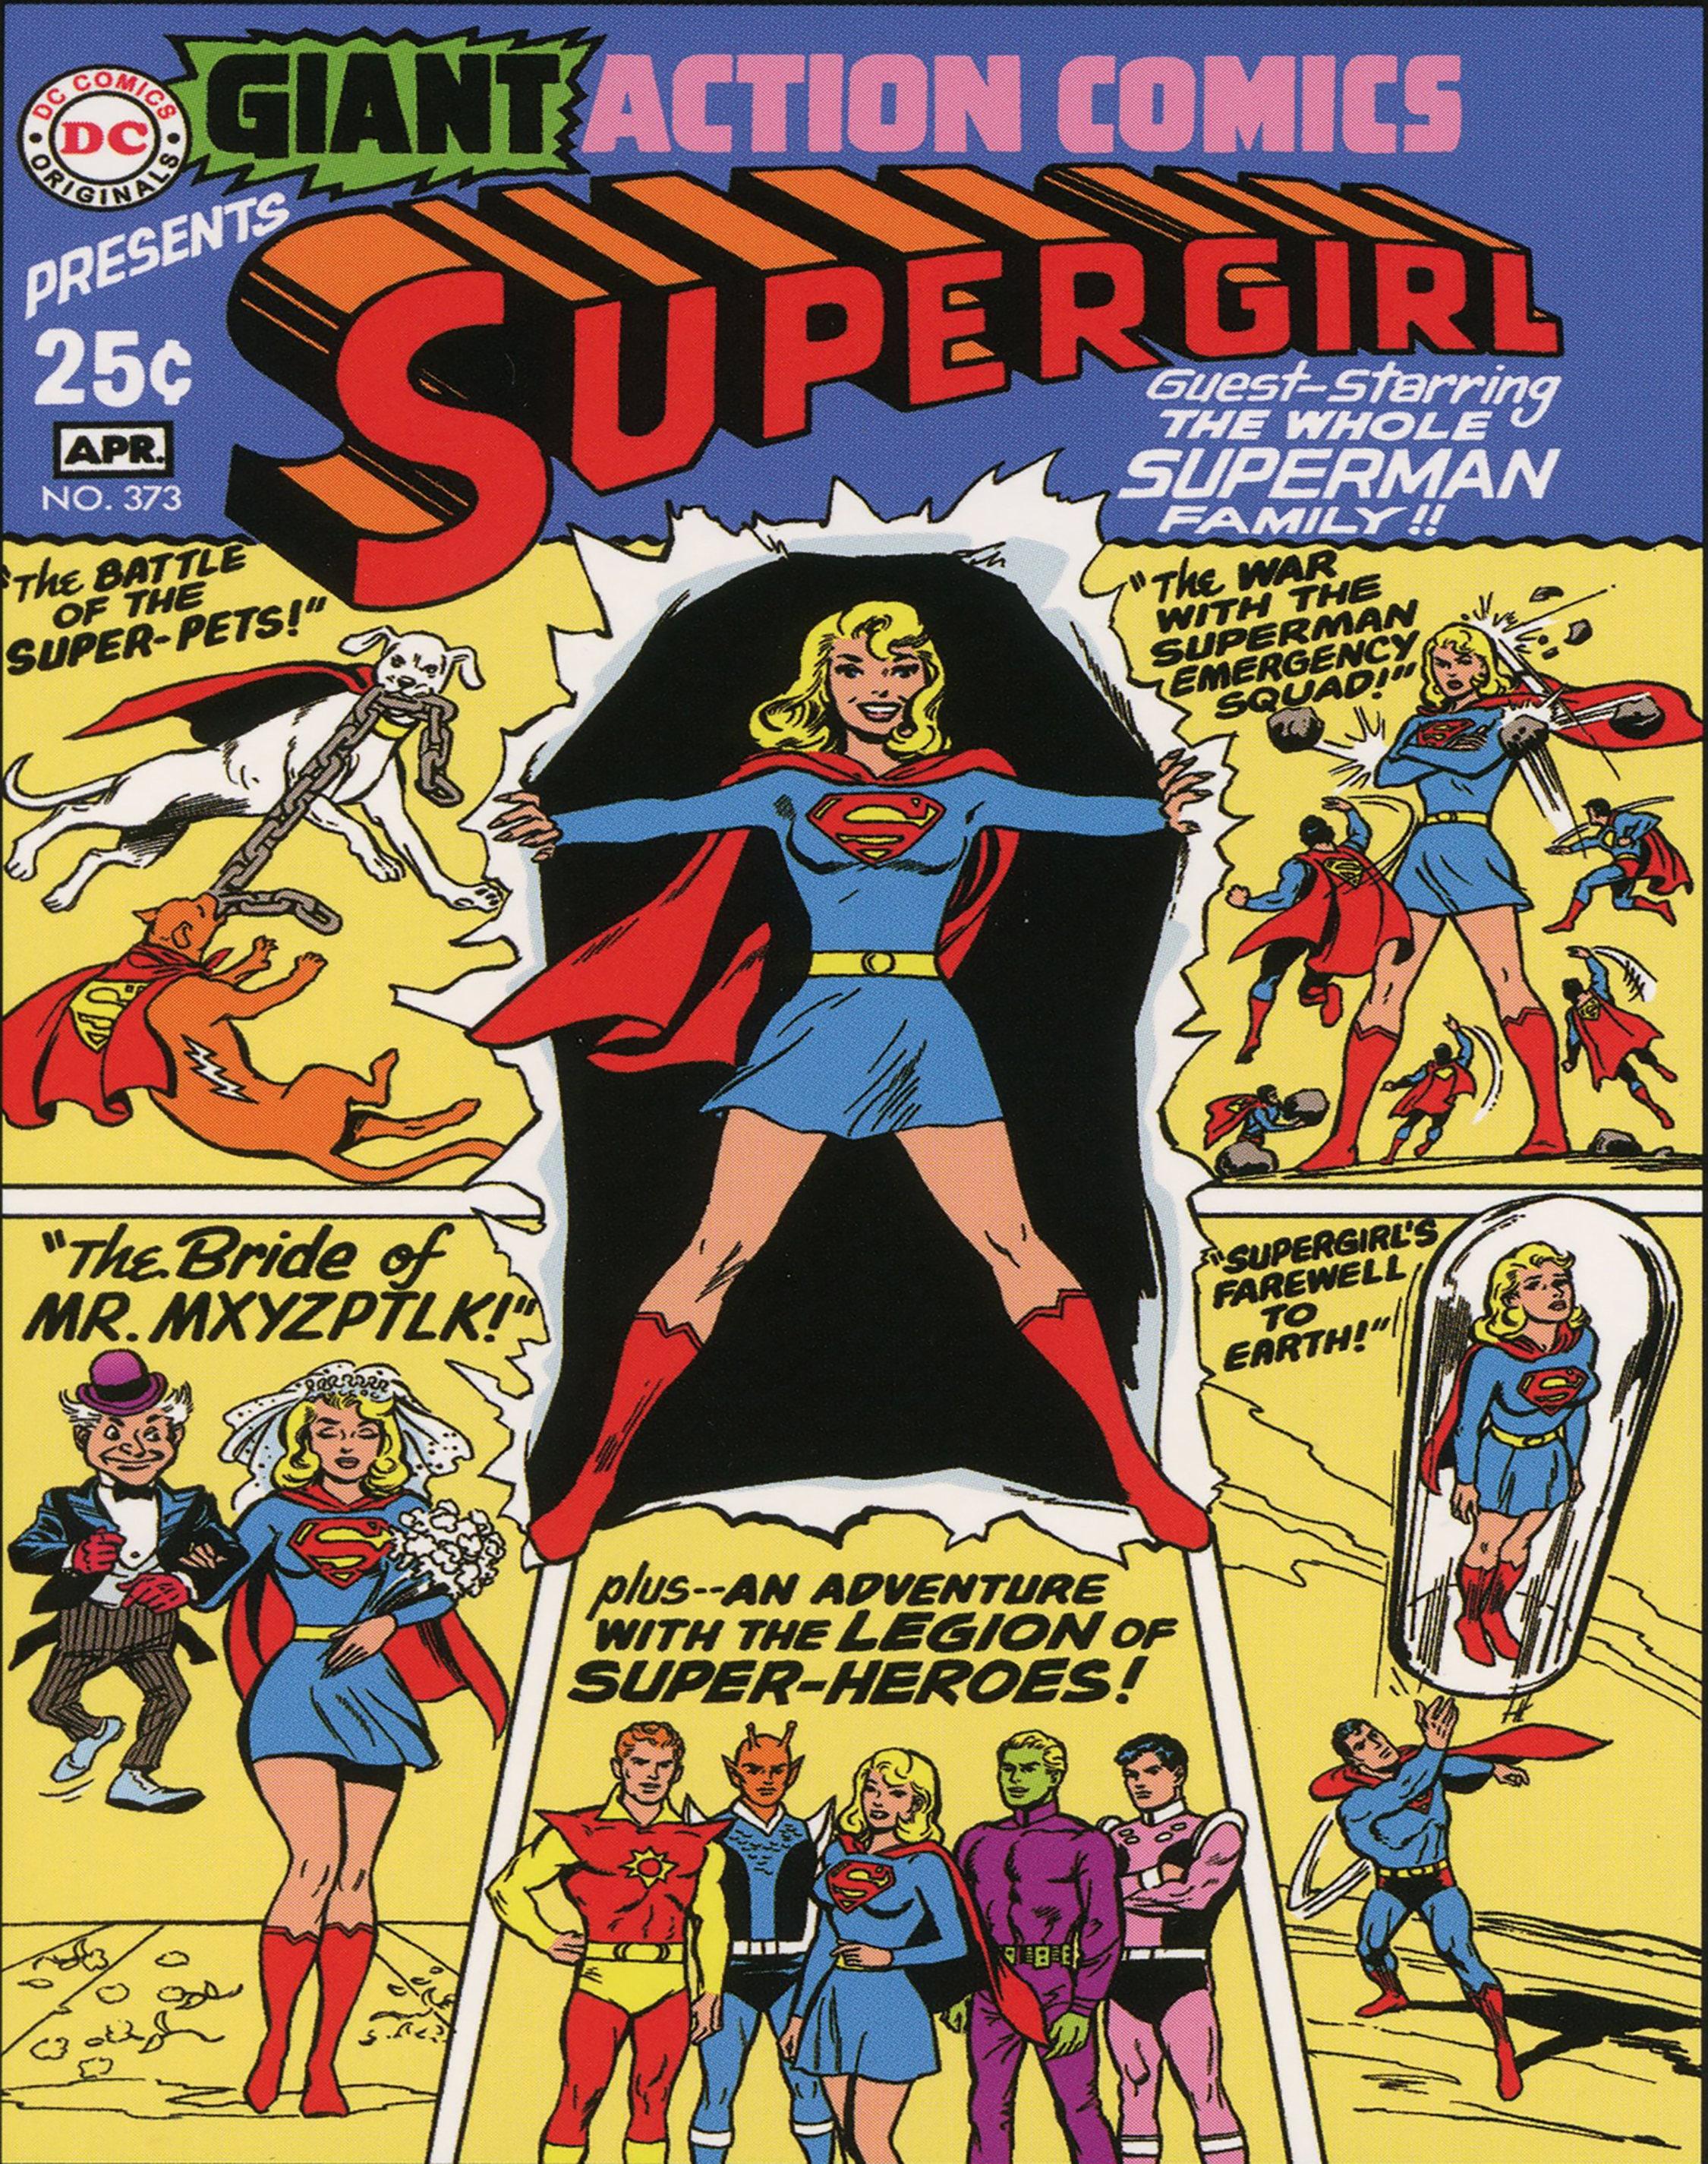 Supergirl Poster Girl Superhero Wall Art Dc Comics